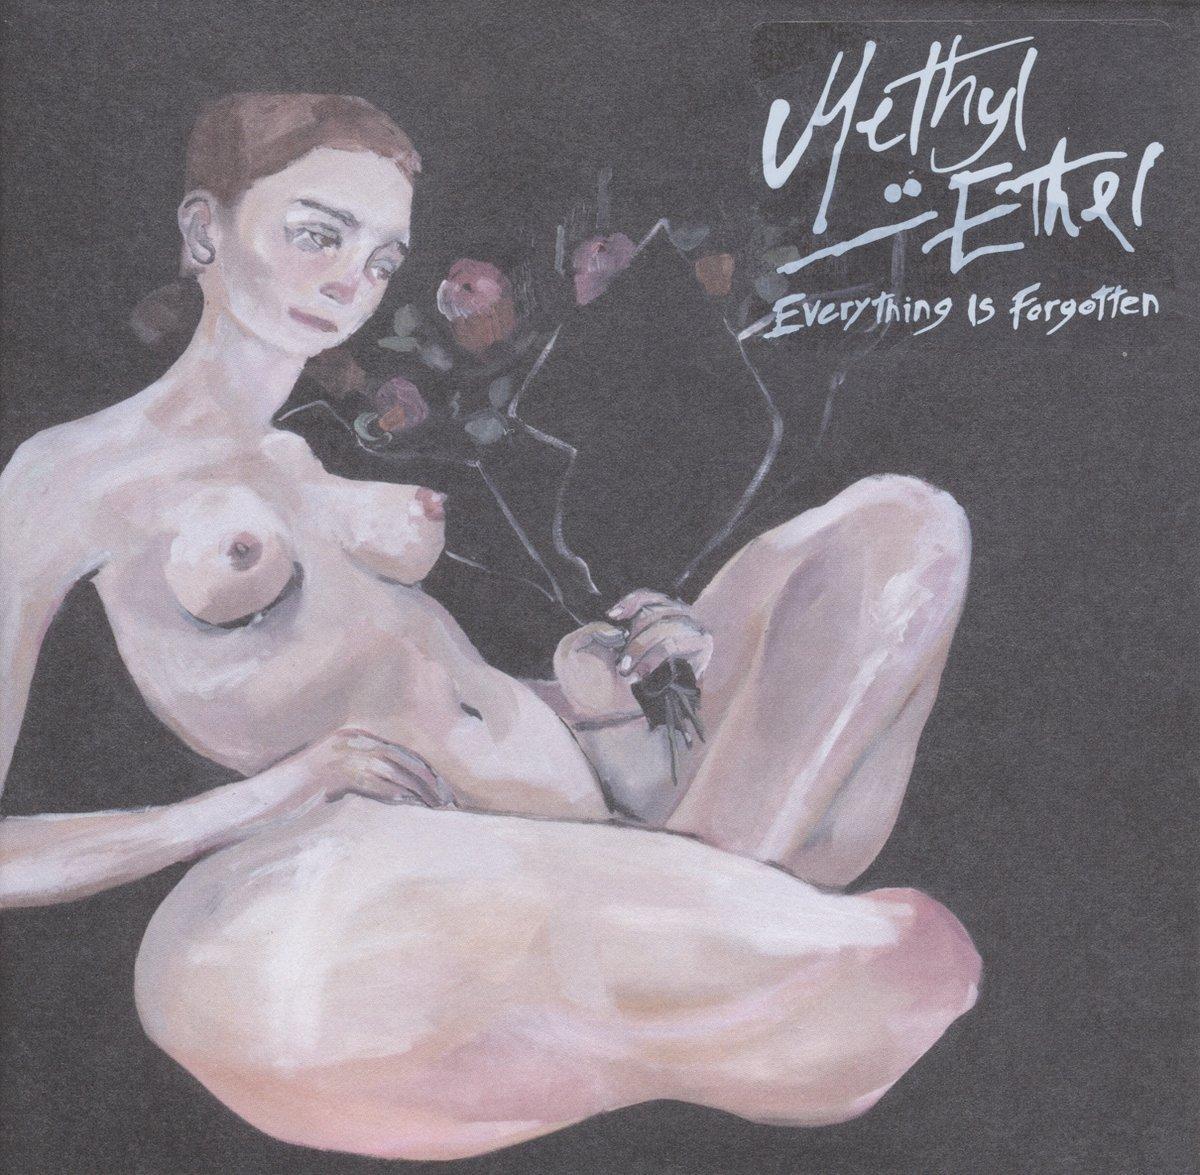 Methyl Ethel – Everything Is Forgotten (4AD)